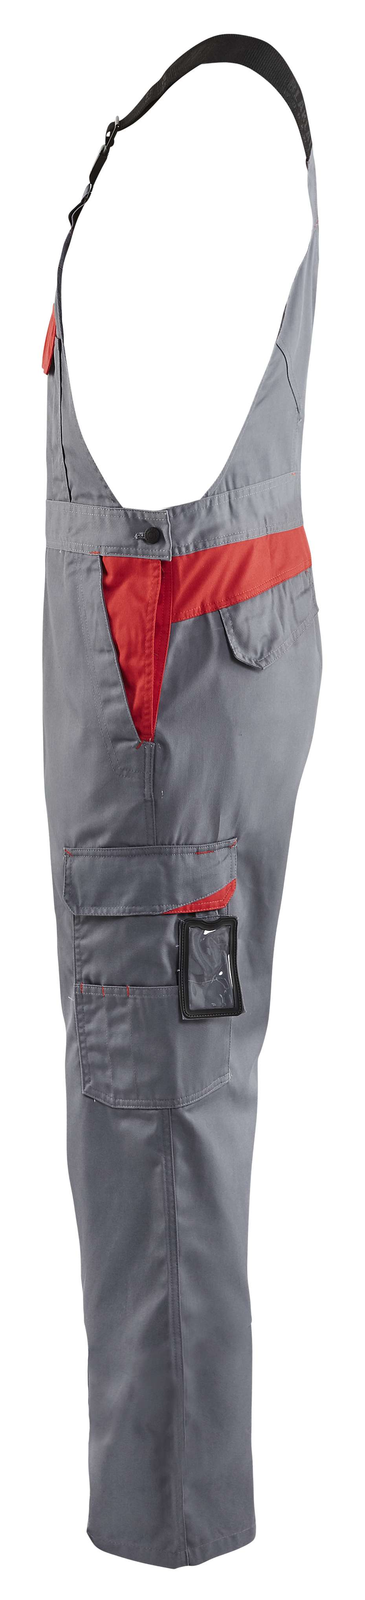 Blaklader Amerikaanse overalls 26641800 grijs-rood(9456)